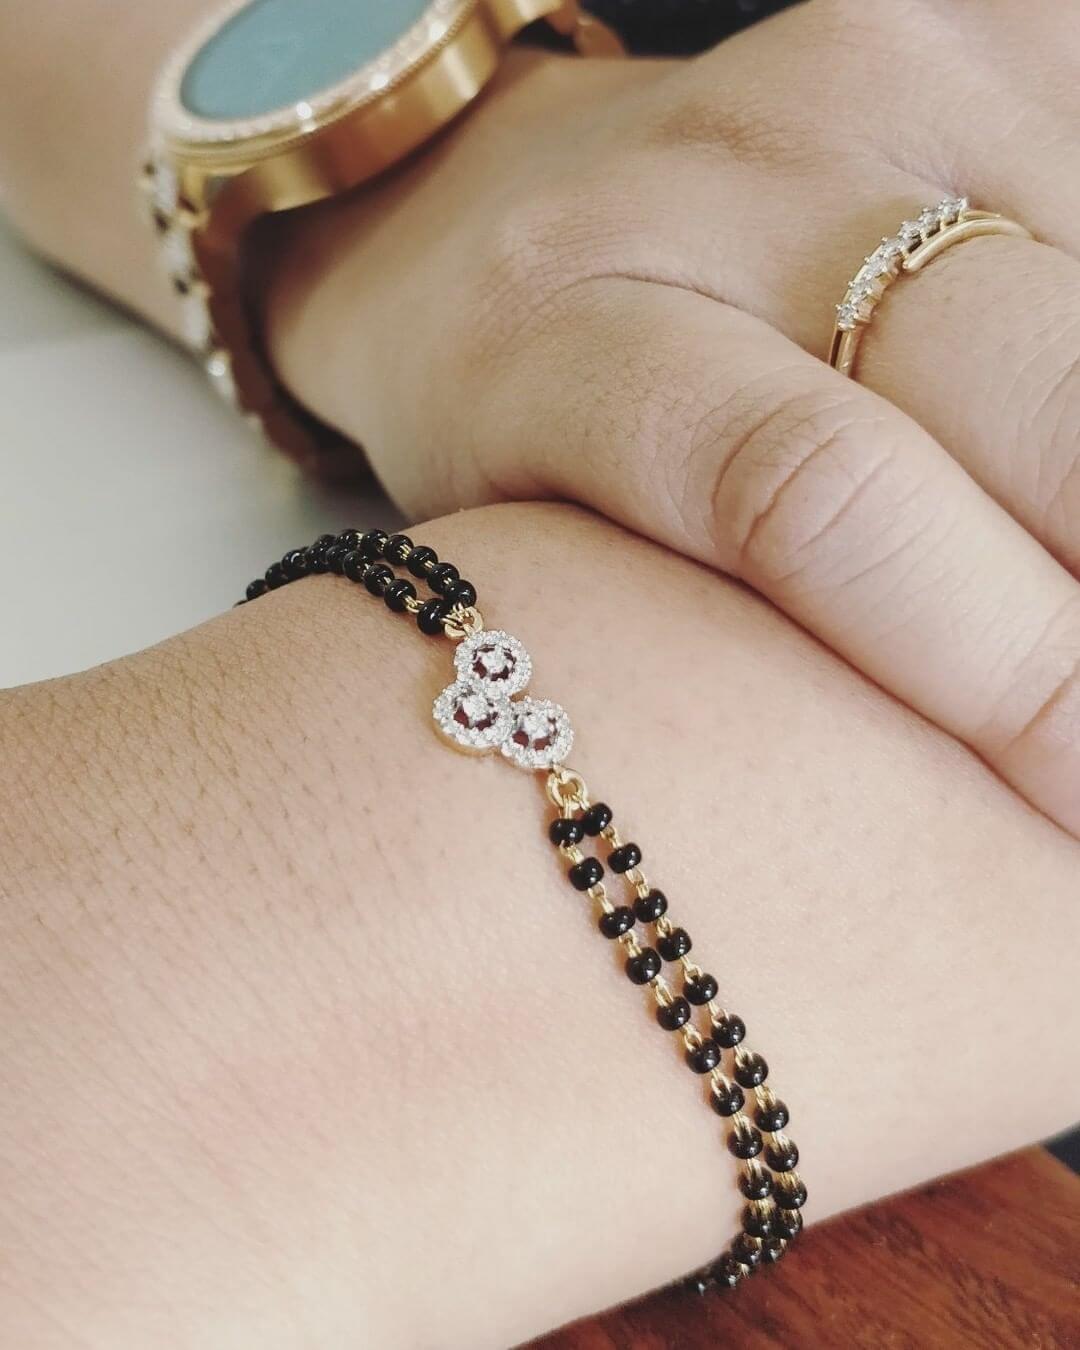 mangalsutra bracelets